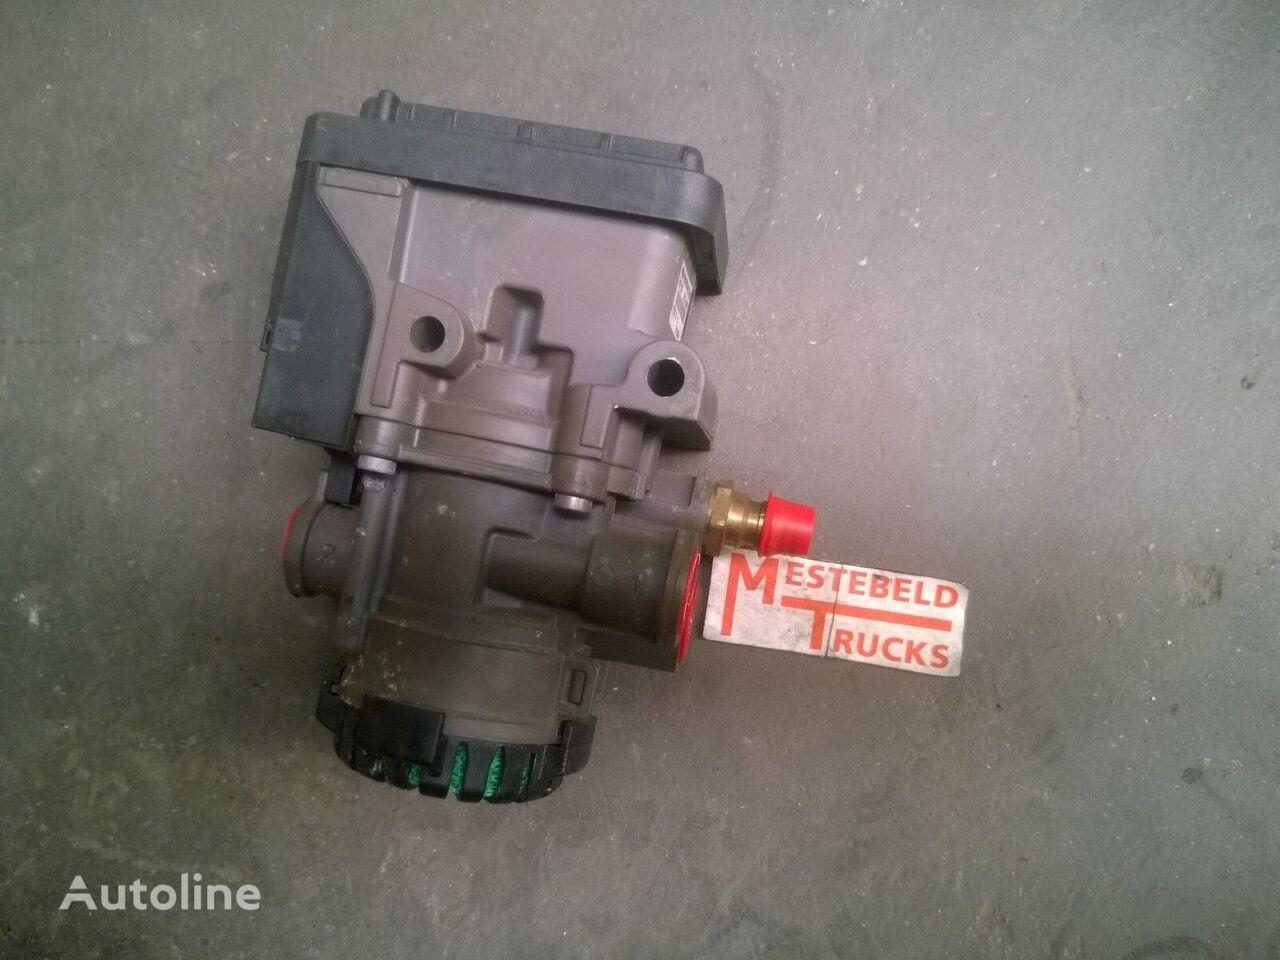 EBS Voorasmodulator RENAULT spare parts for RENAULT EBS Voorasmodulator truck